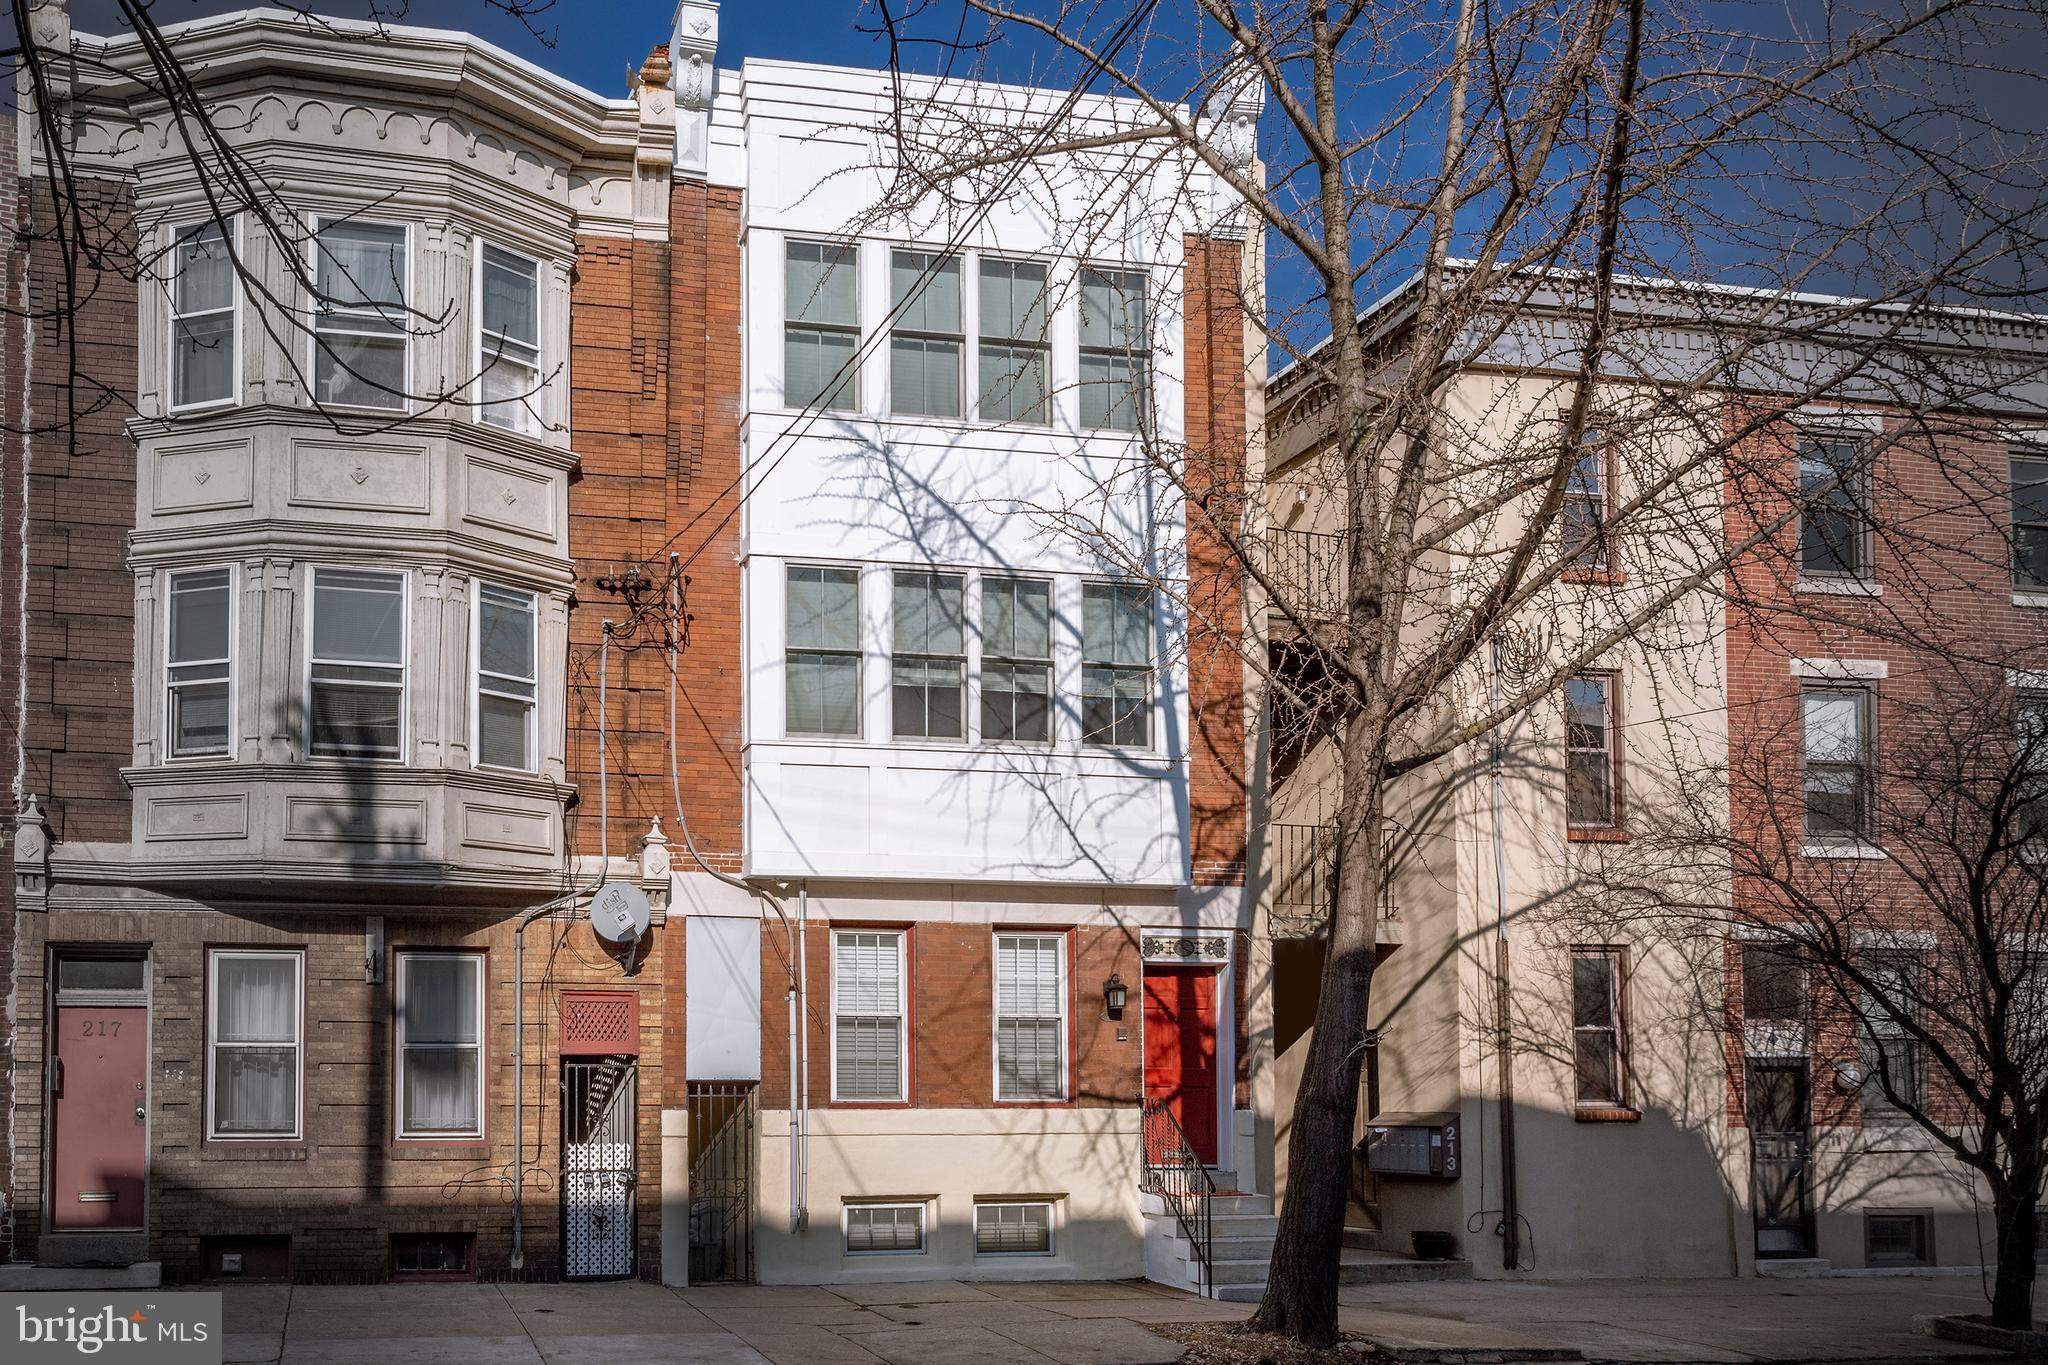 215 Christian St, Philadelphia, PA, 19147